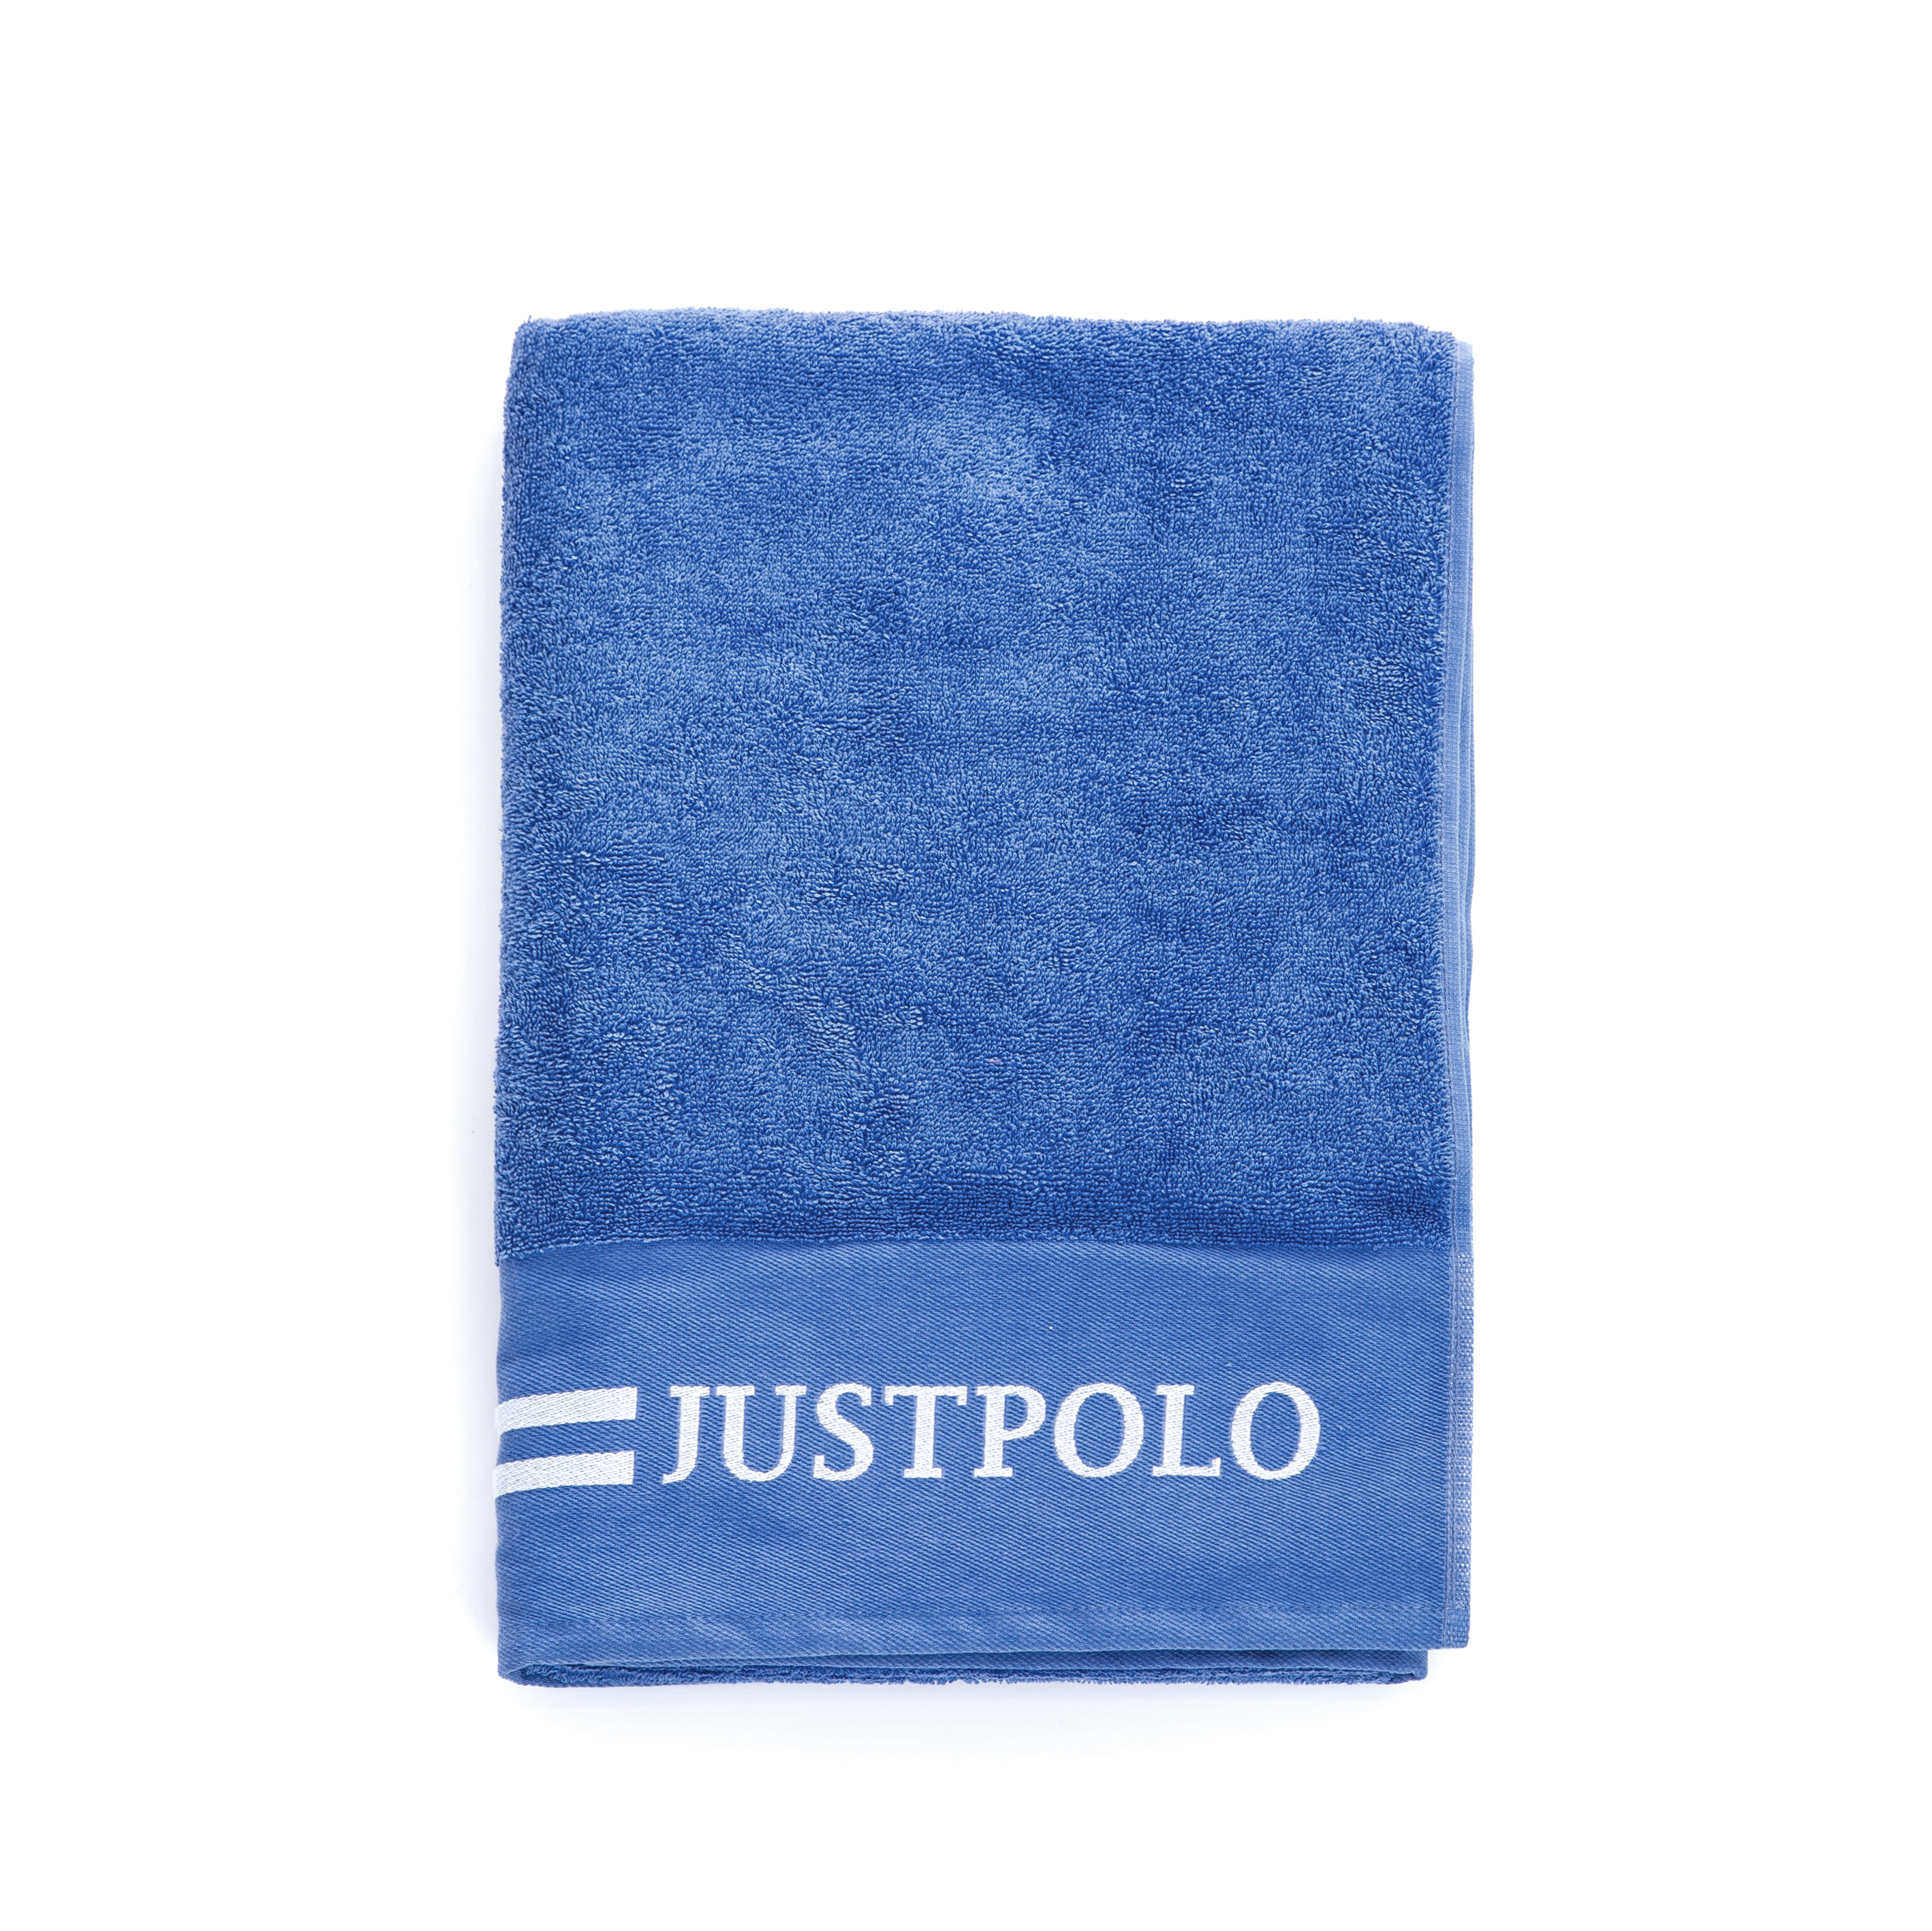 JUST POLO – Πετσέτα θαλάσσης JUST POLO μπλε